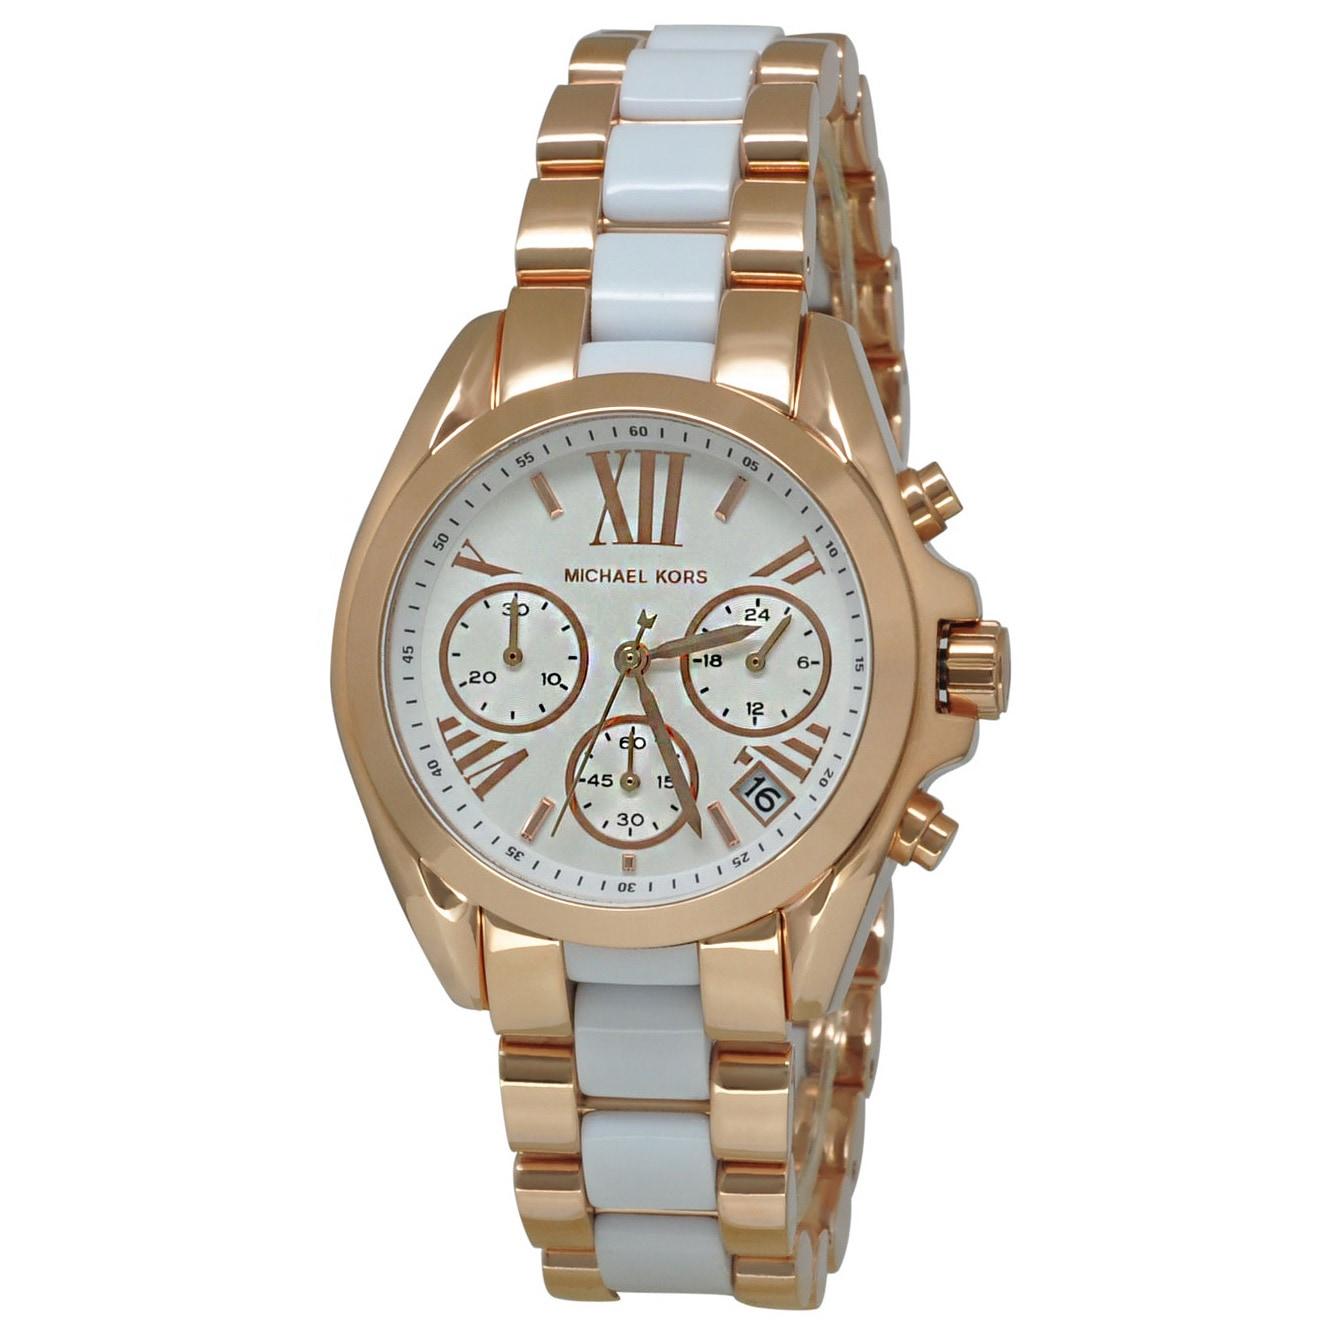 9c0aeca35f0a Shop Michael Kors Women s MK5907 Bradshaw Mini Rose Gold Watch - Free  Shipping Today - Overstock - 9104383